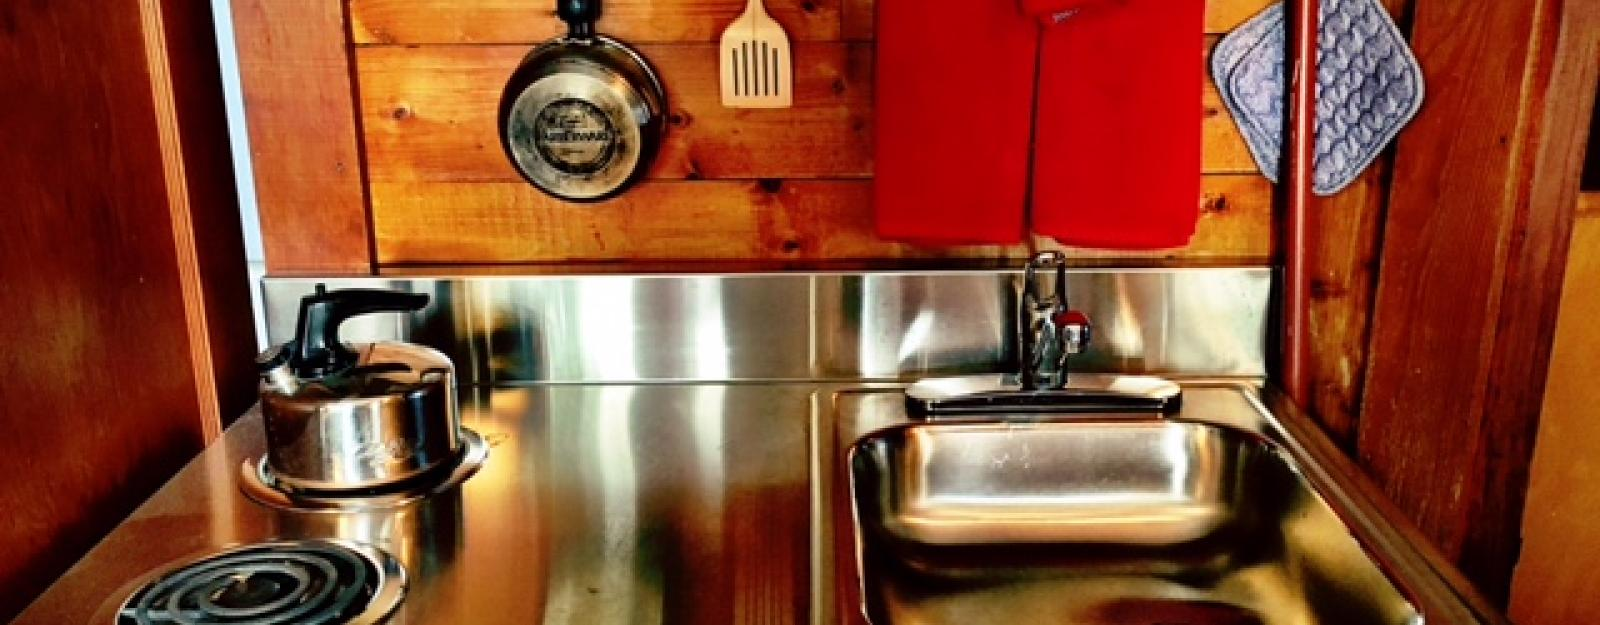 Retro Kitchenette at Appolt Cabin